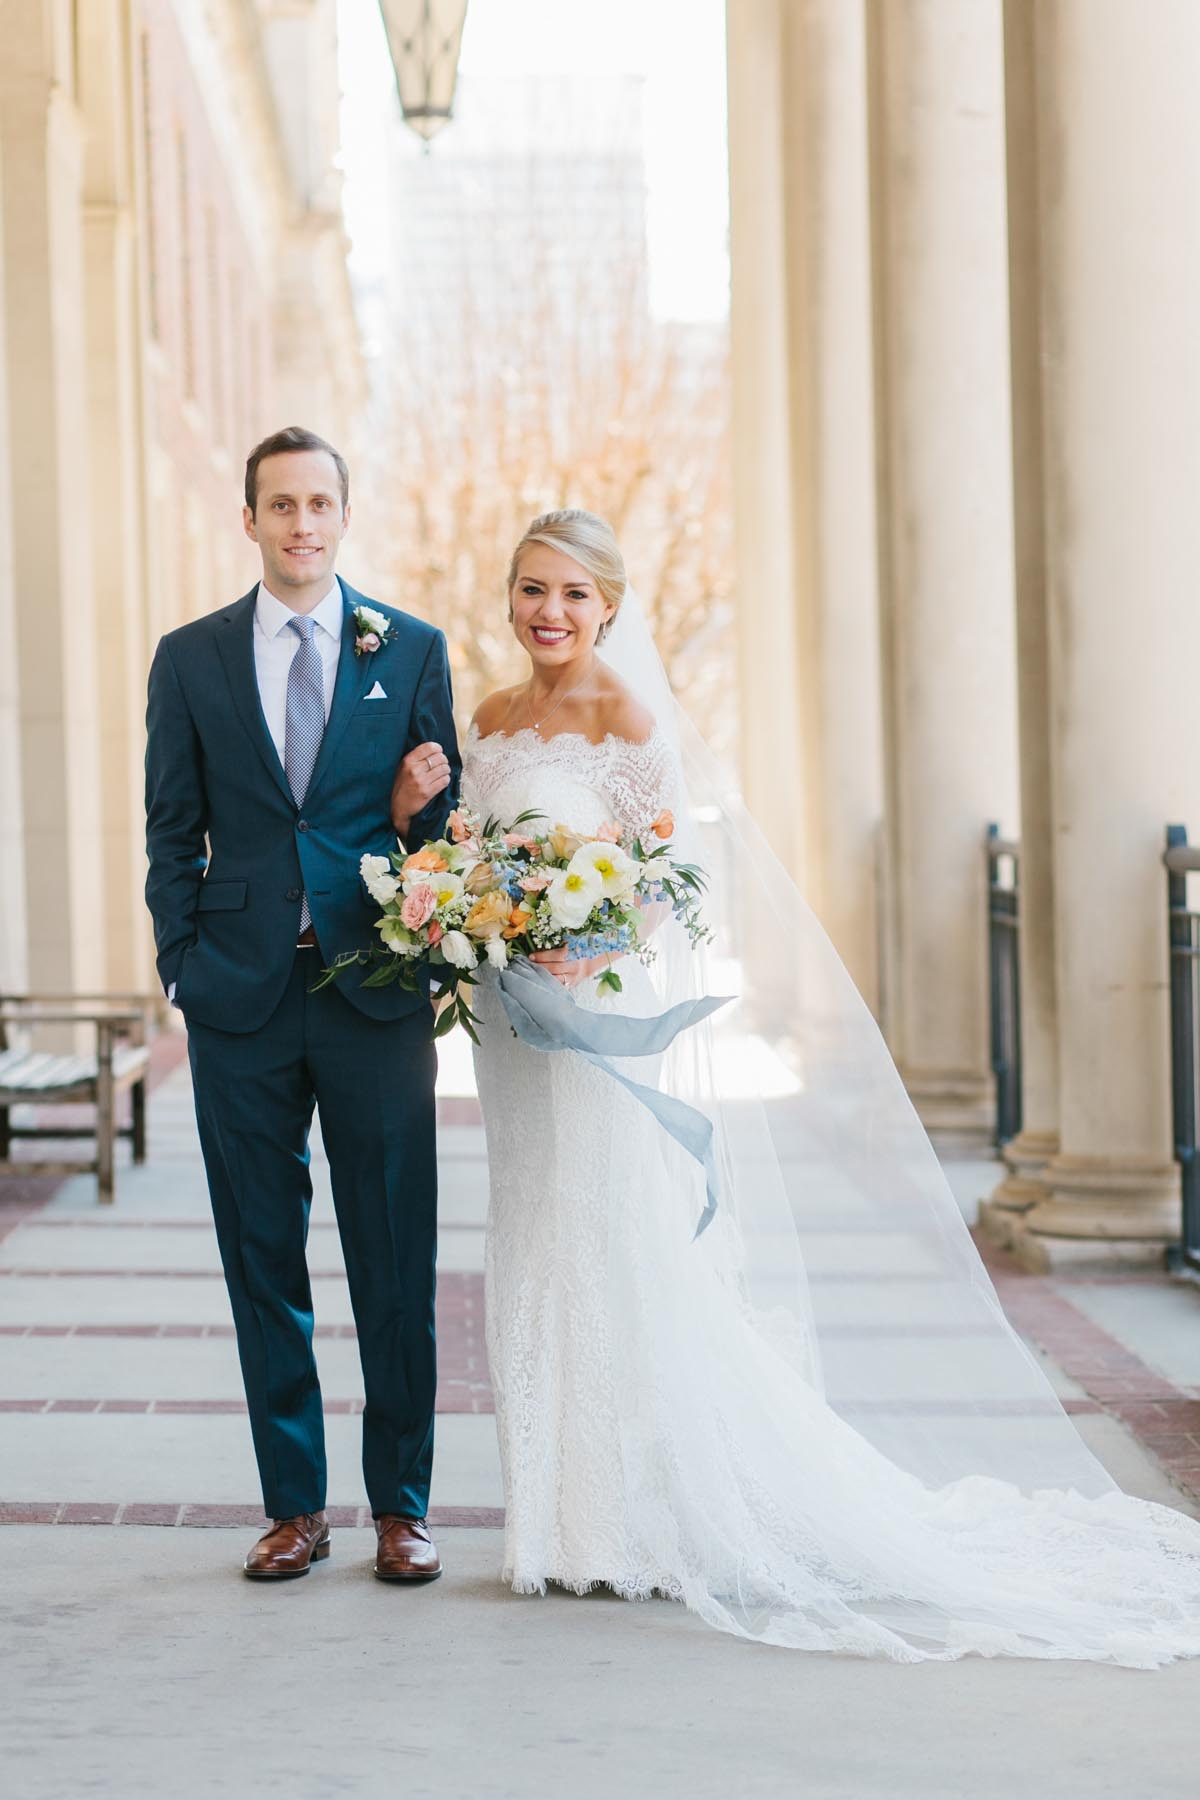 kjellman wedding blog biltmore wedding -36